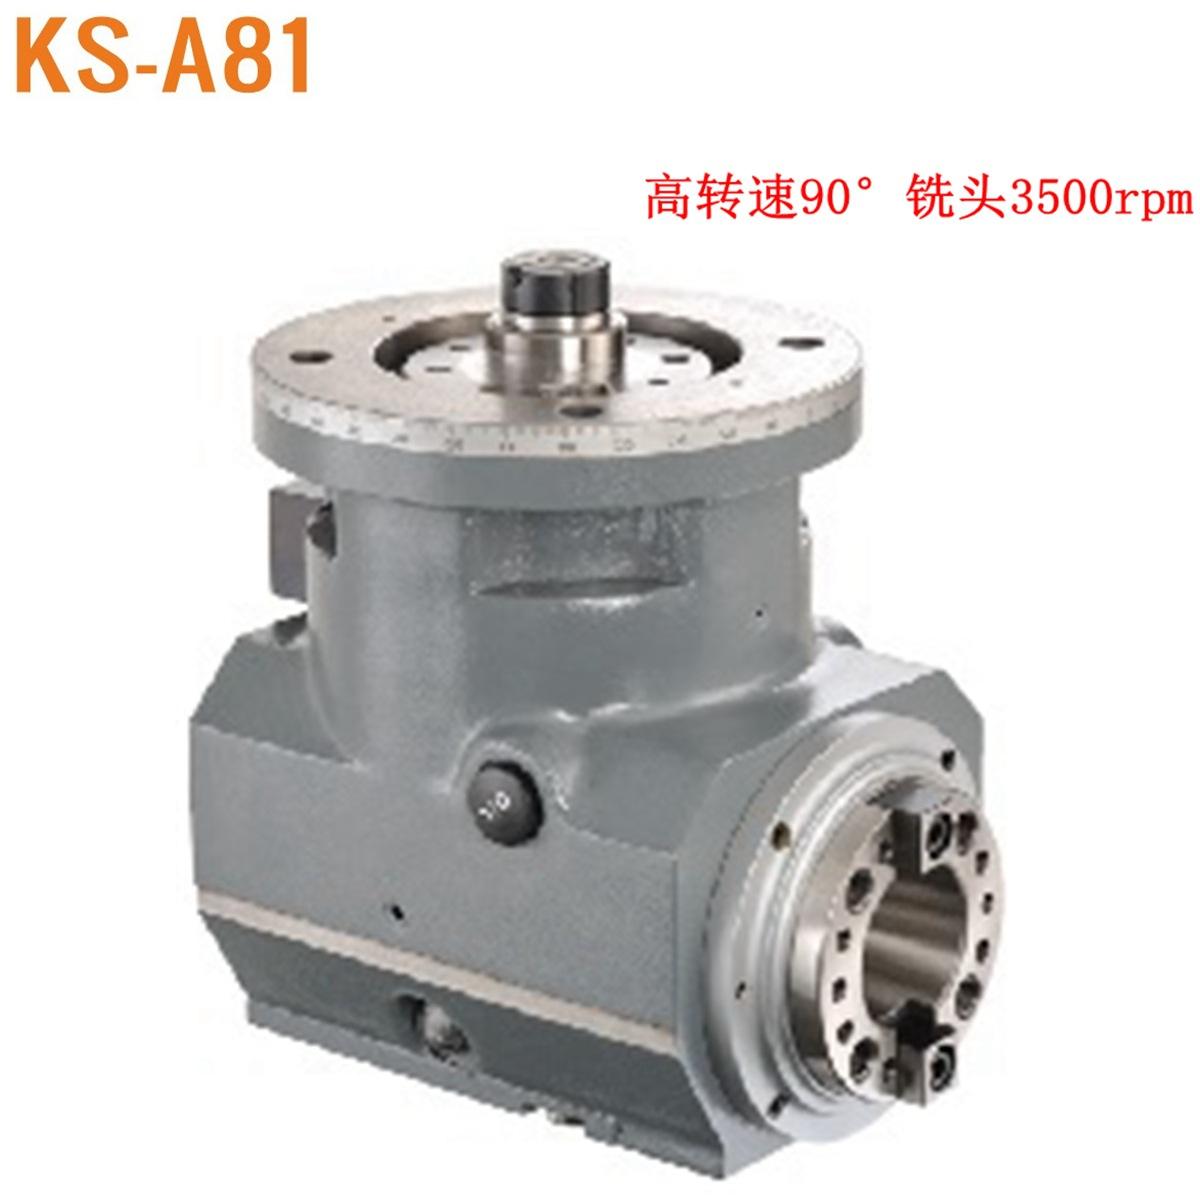 KS-A81图1